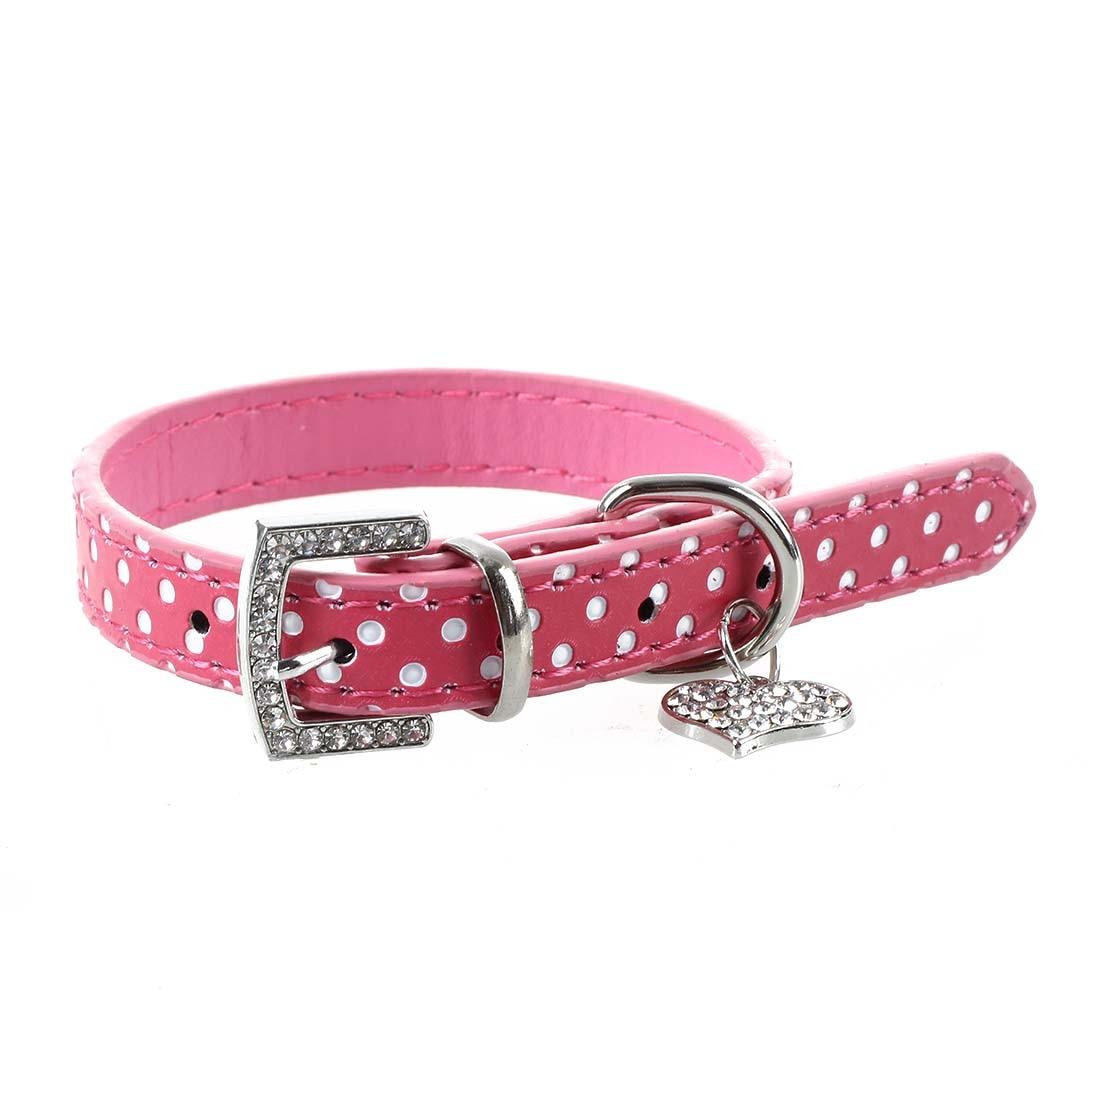 Hot Sale Rhinestone PU Leather Adjustable collar for Dog Cat Pet Pink XS